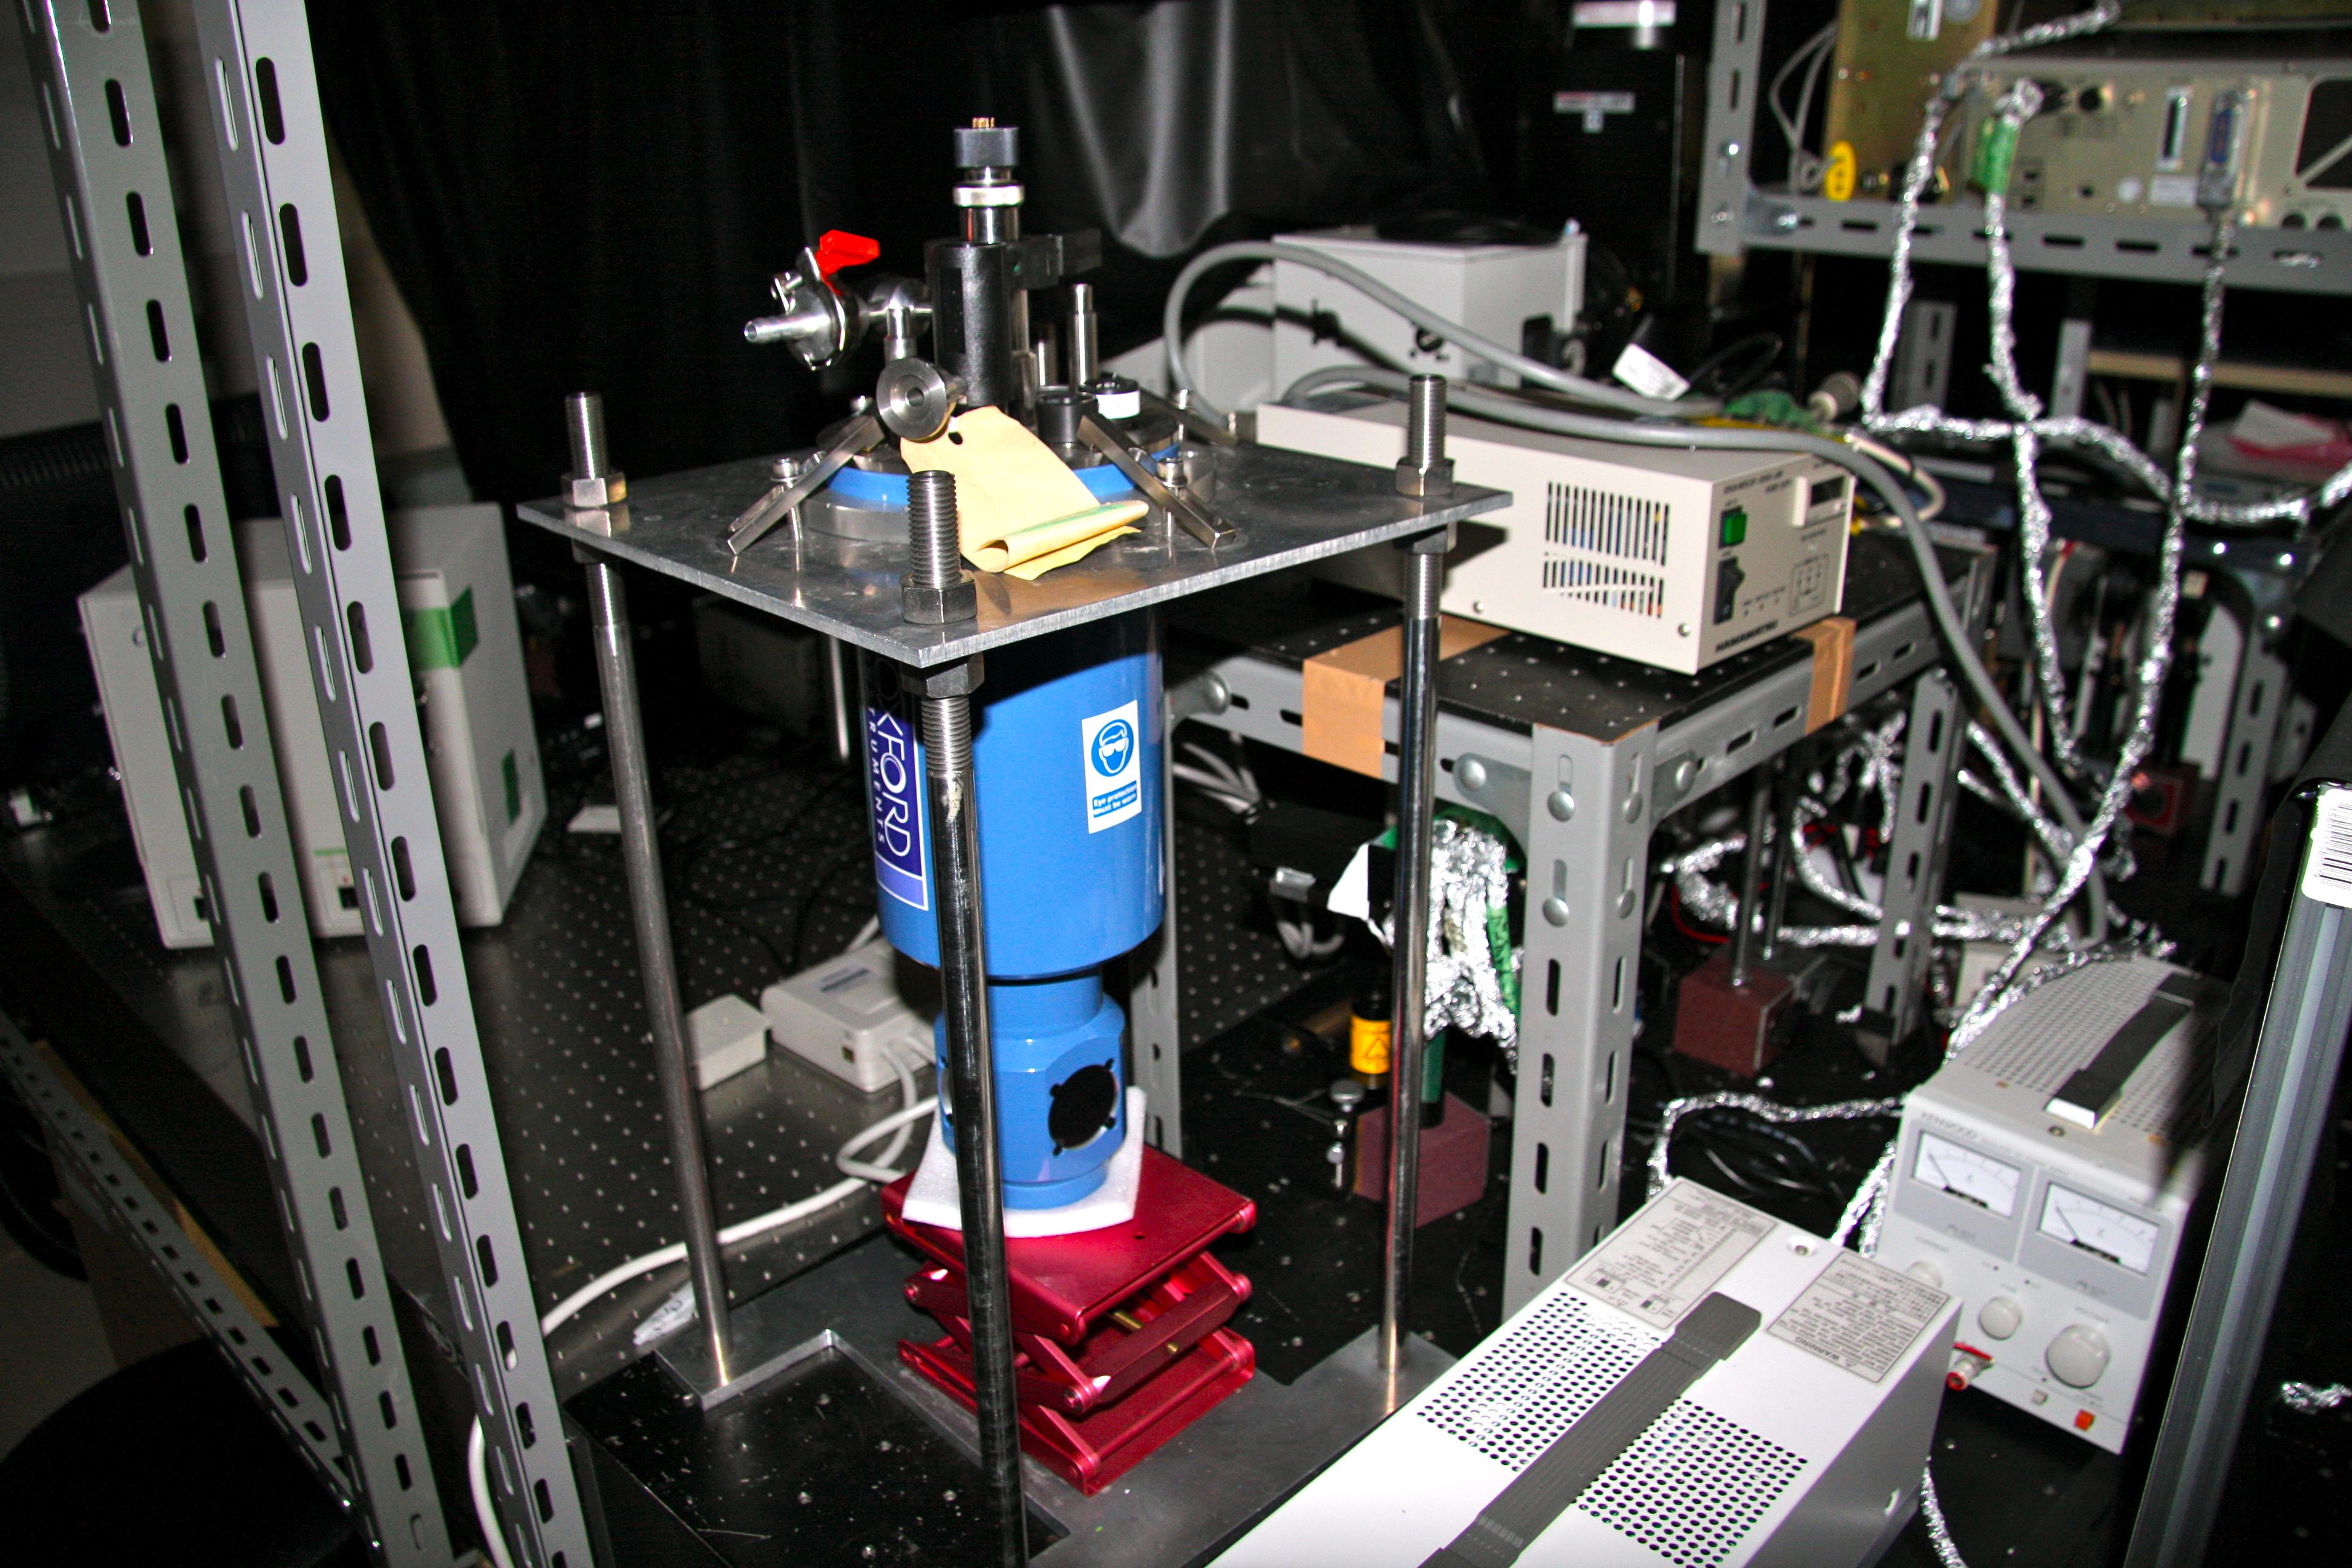 Stark(電場変調)分光計測装置